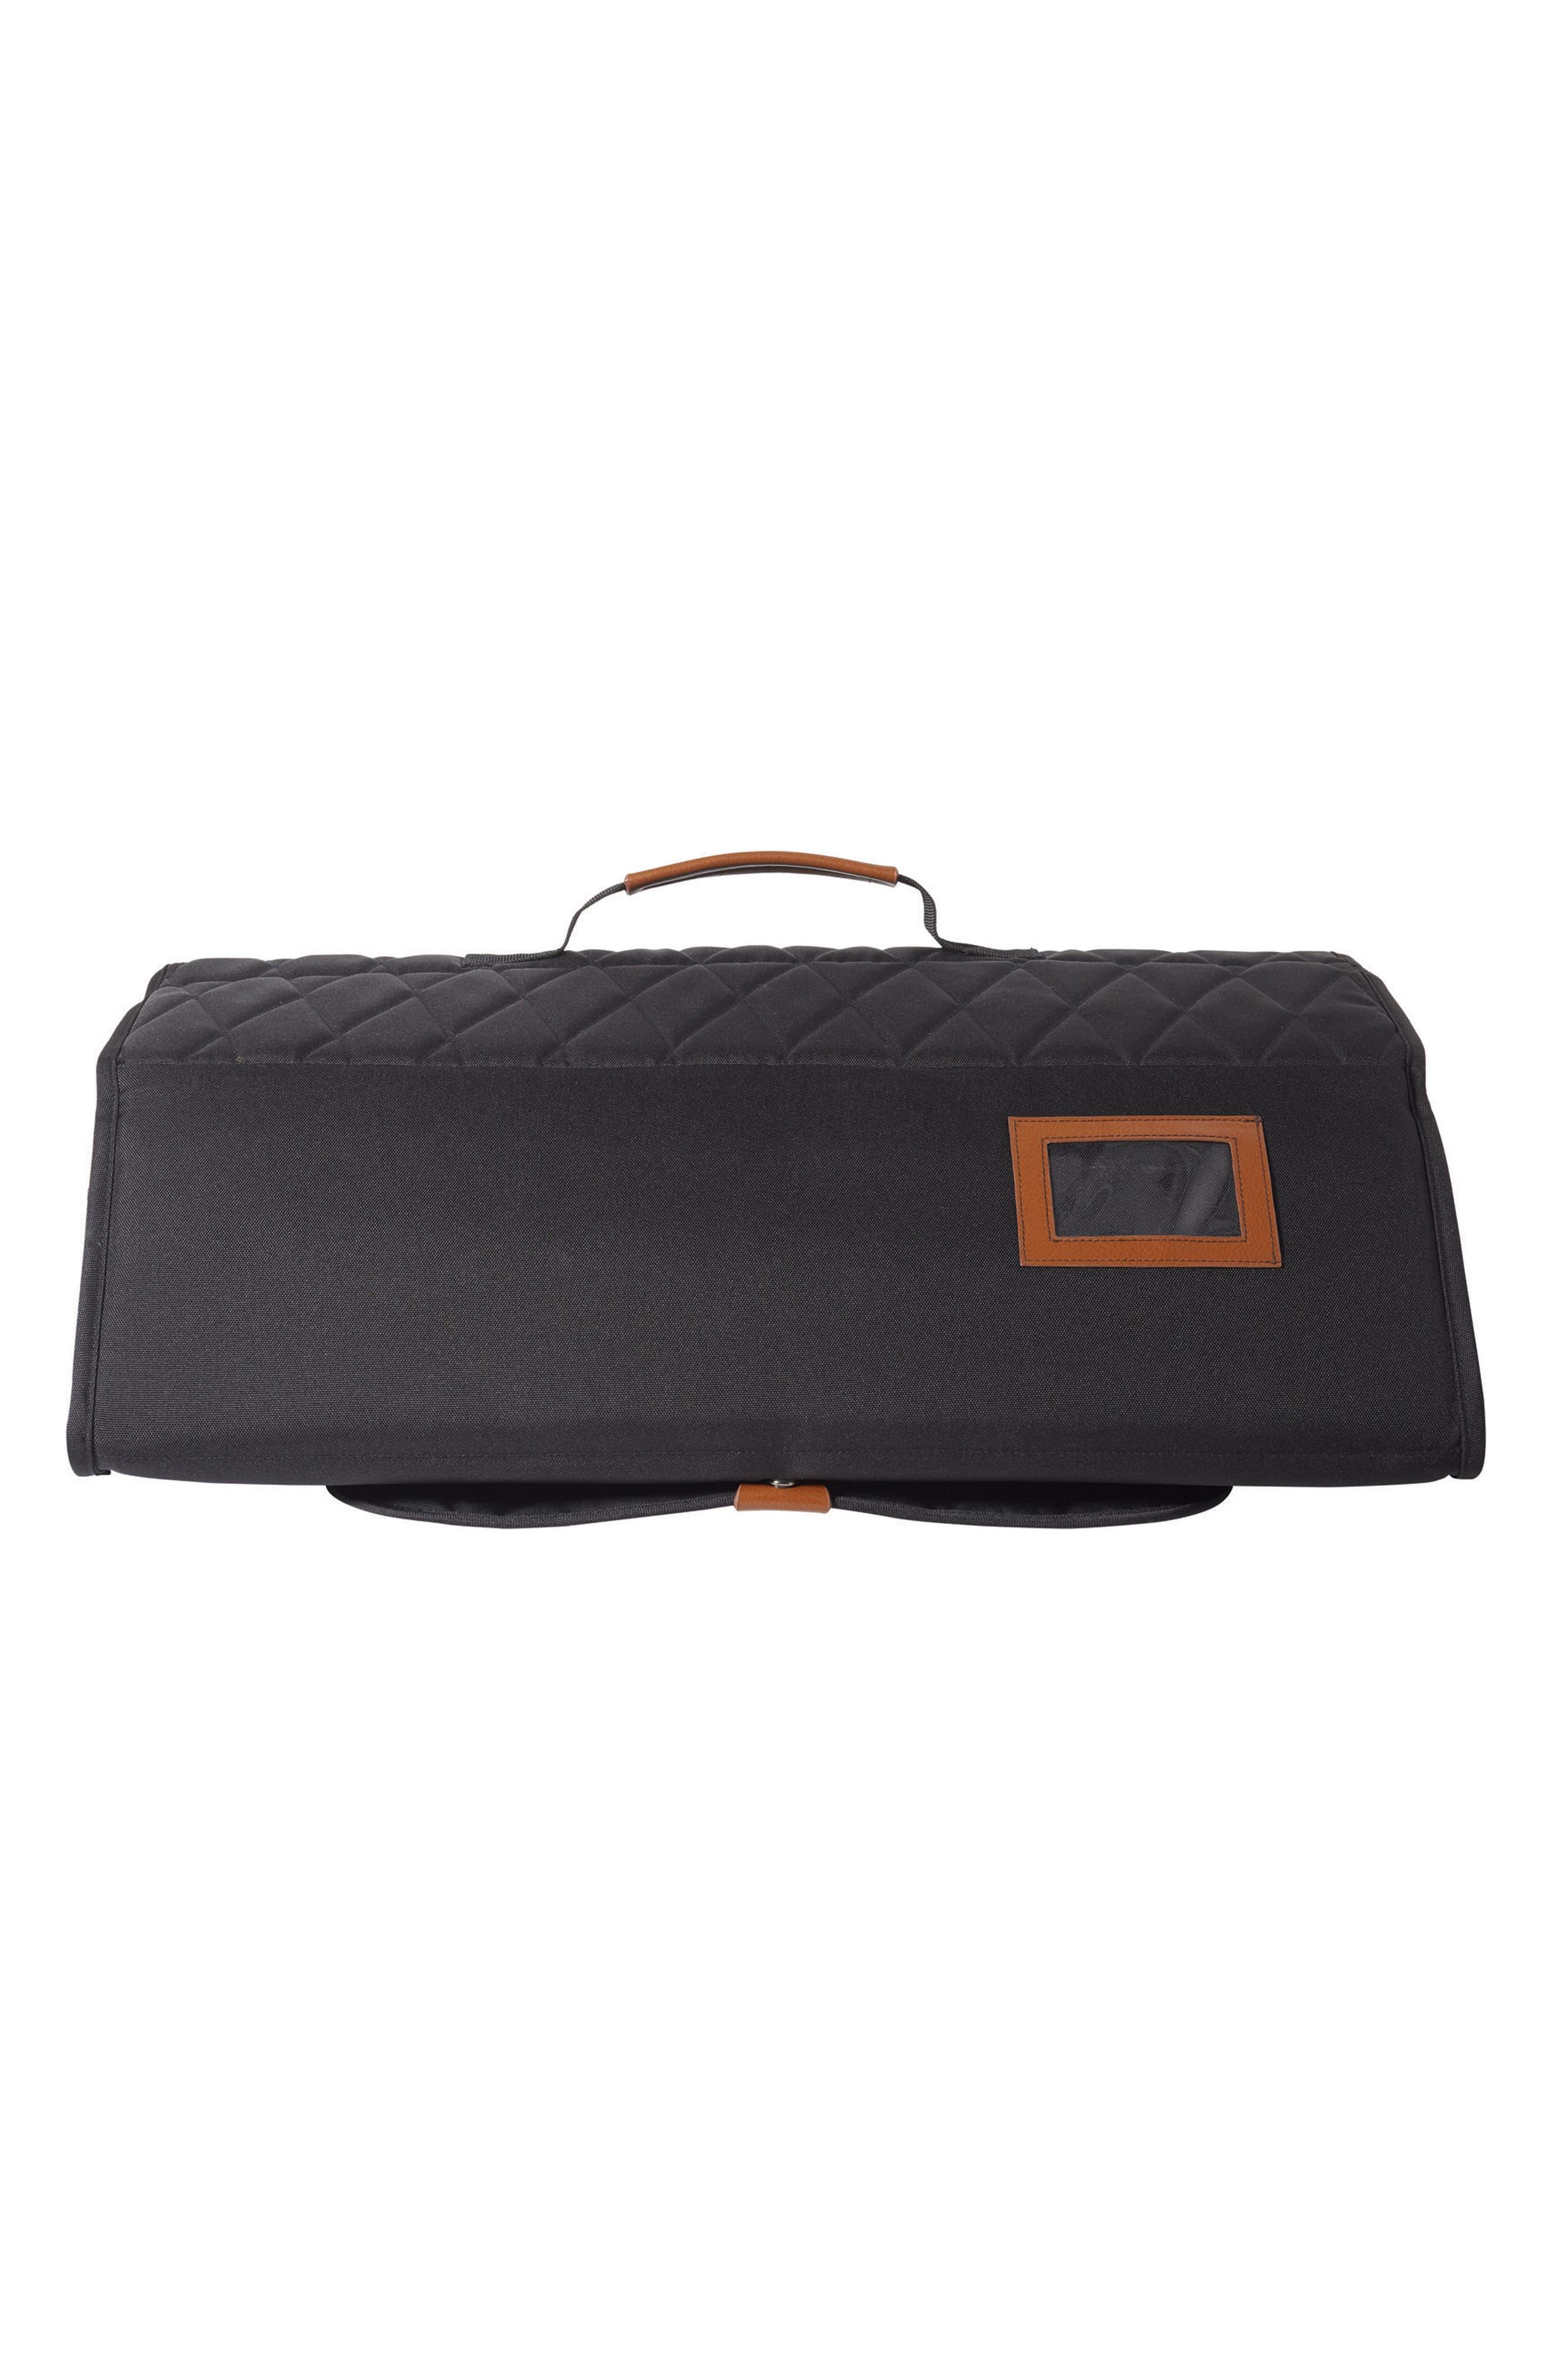 Traveller Water-Resistant Stroller Travel Bag,                             Alternate thumbnail 2, color,                             BLACK